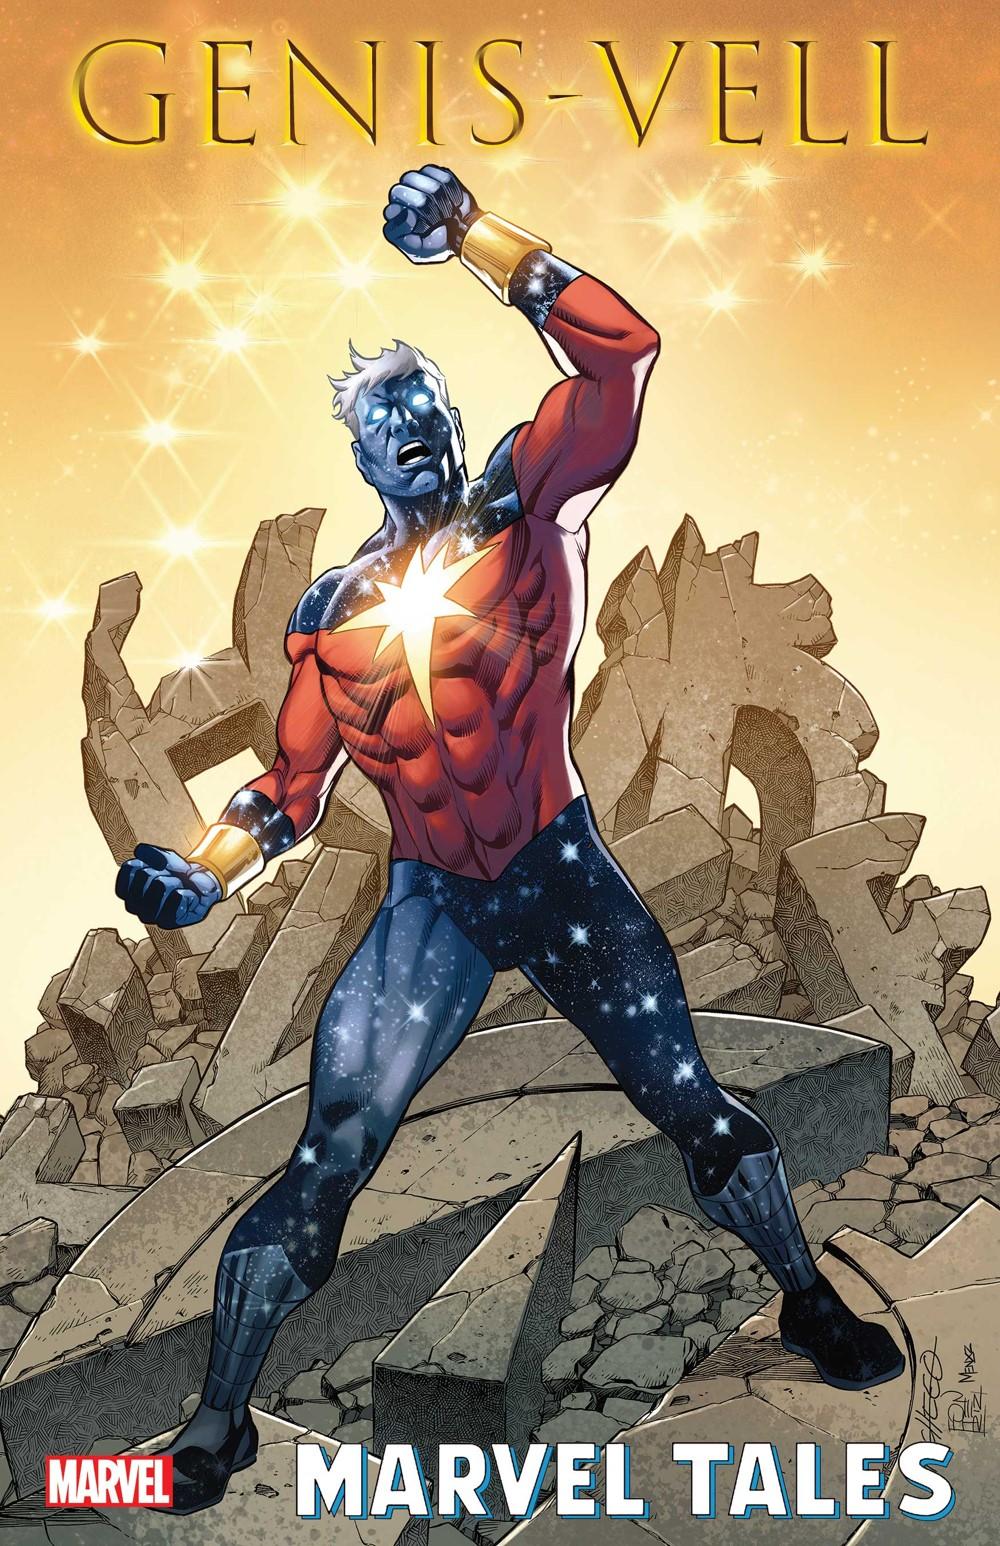 MTGENIS2021001_Pacheco-1 Marvel Comics November 2021 Solicitations